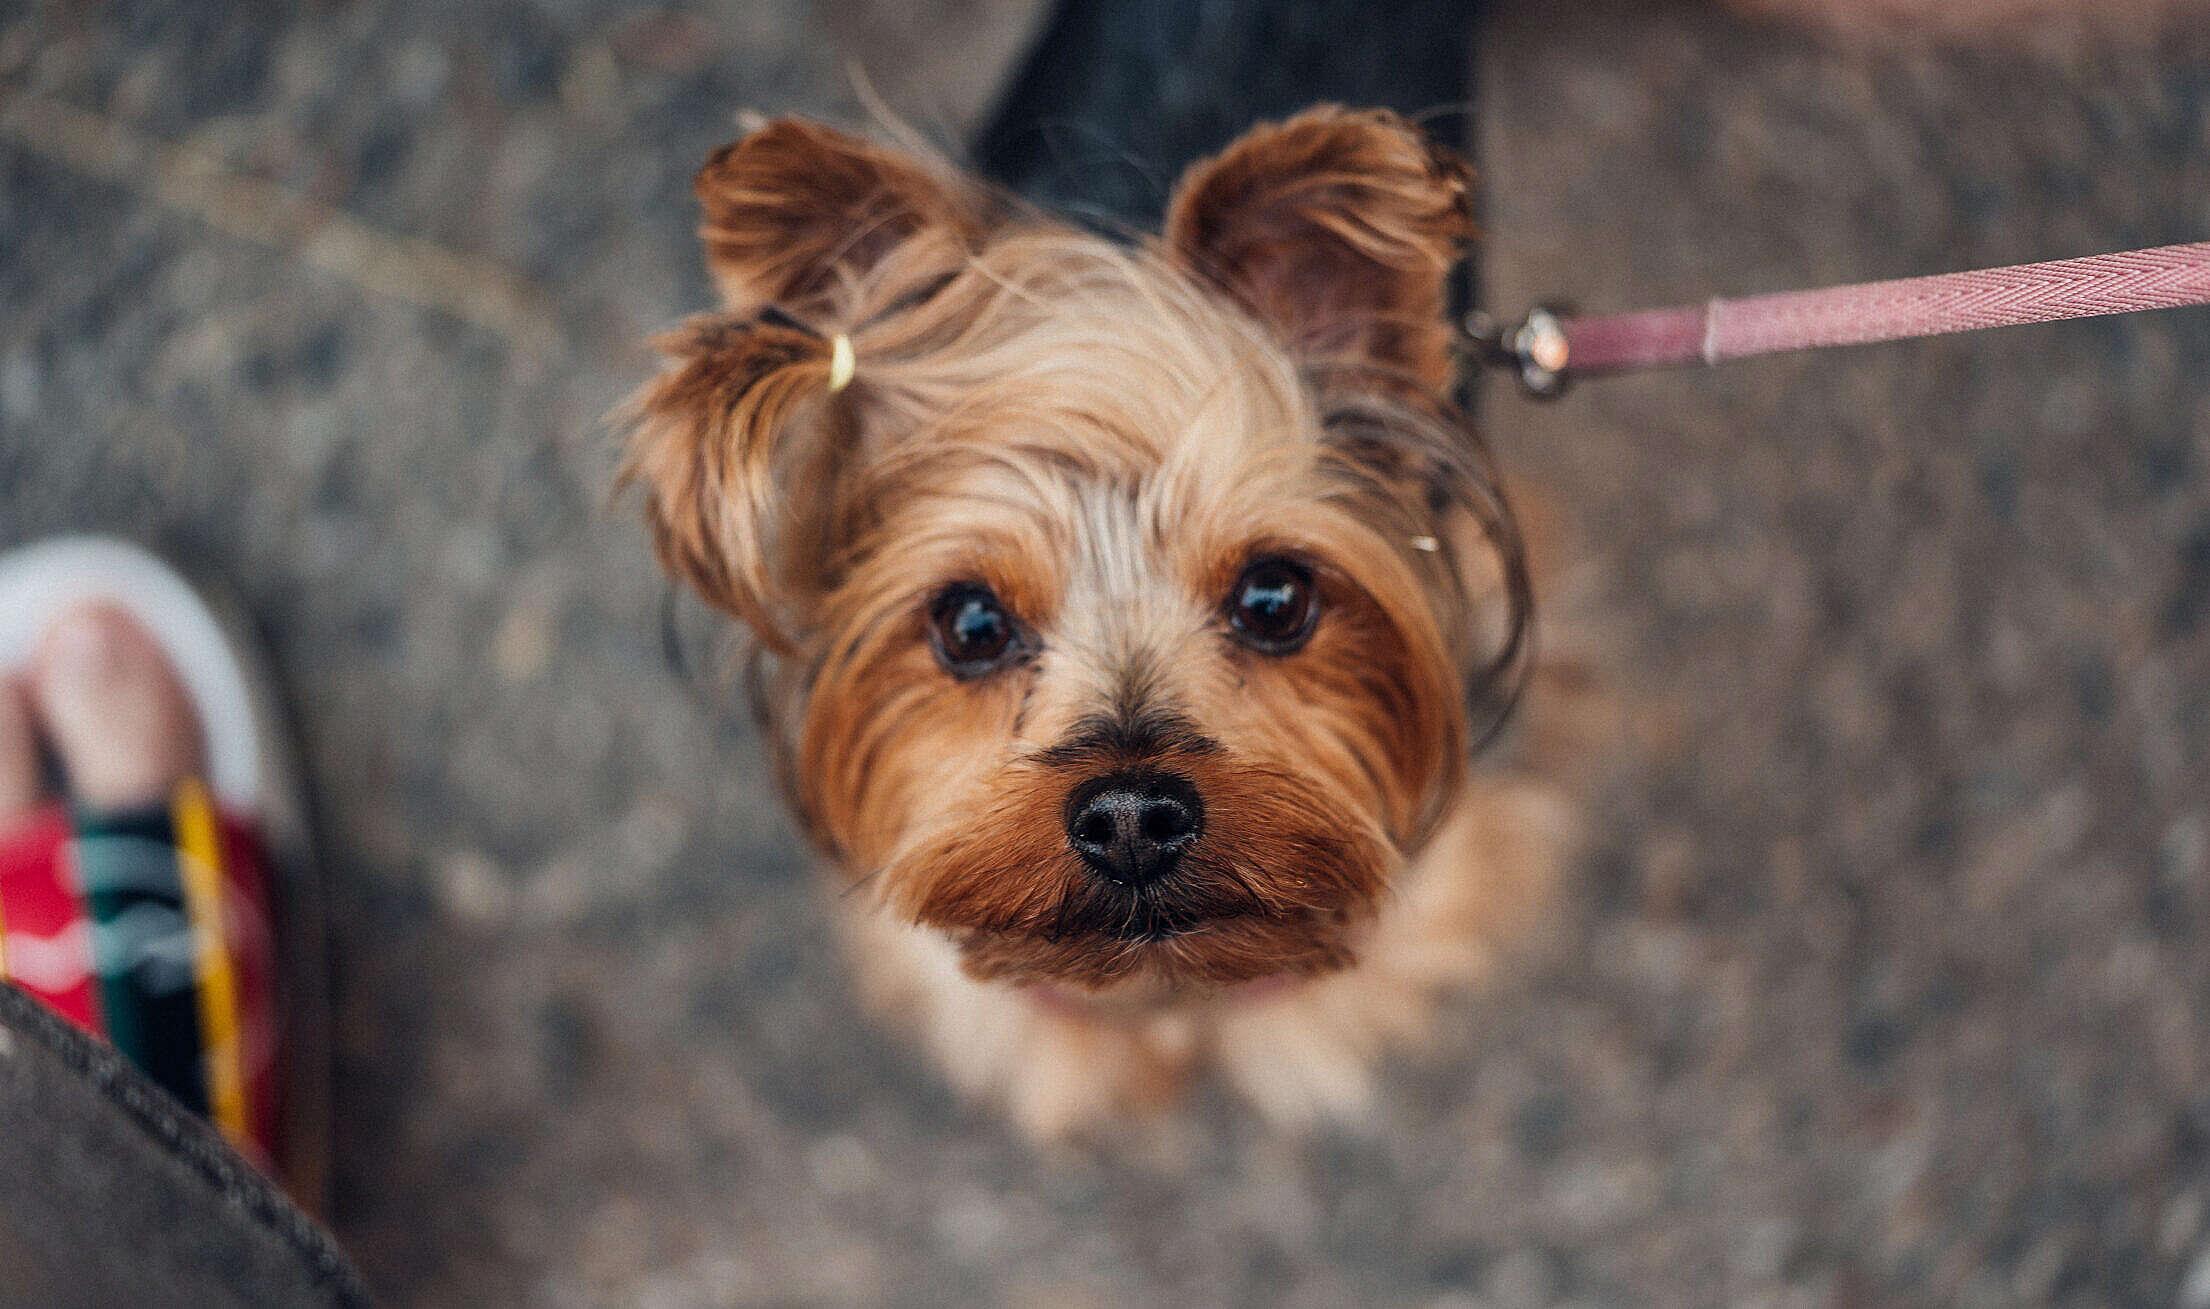 Walking Cute Yorkshire Terrier Free Stock Photo